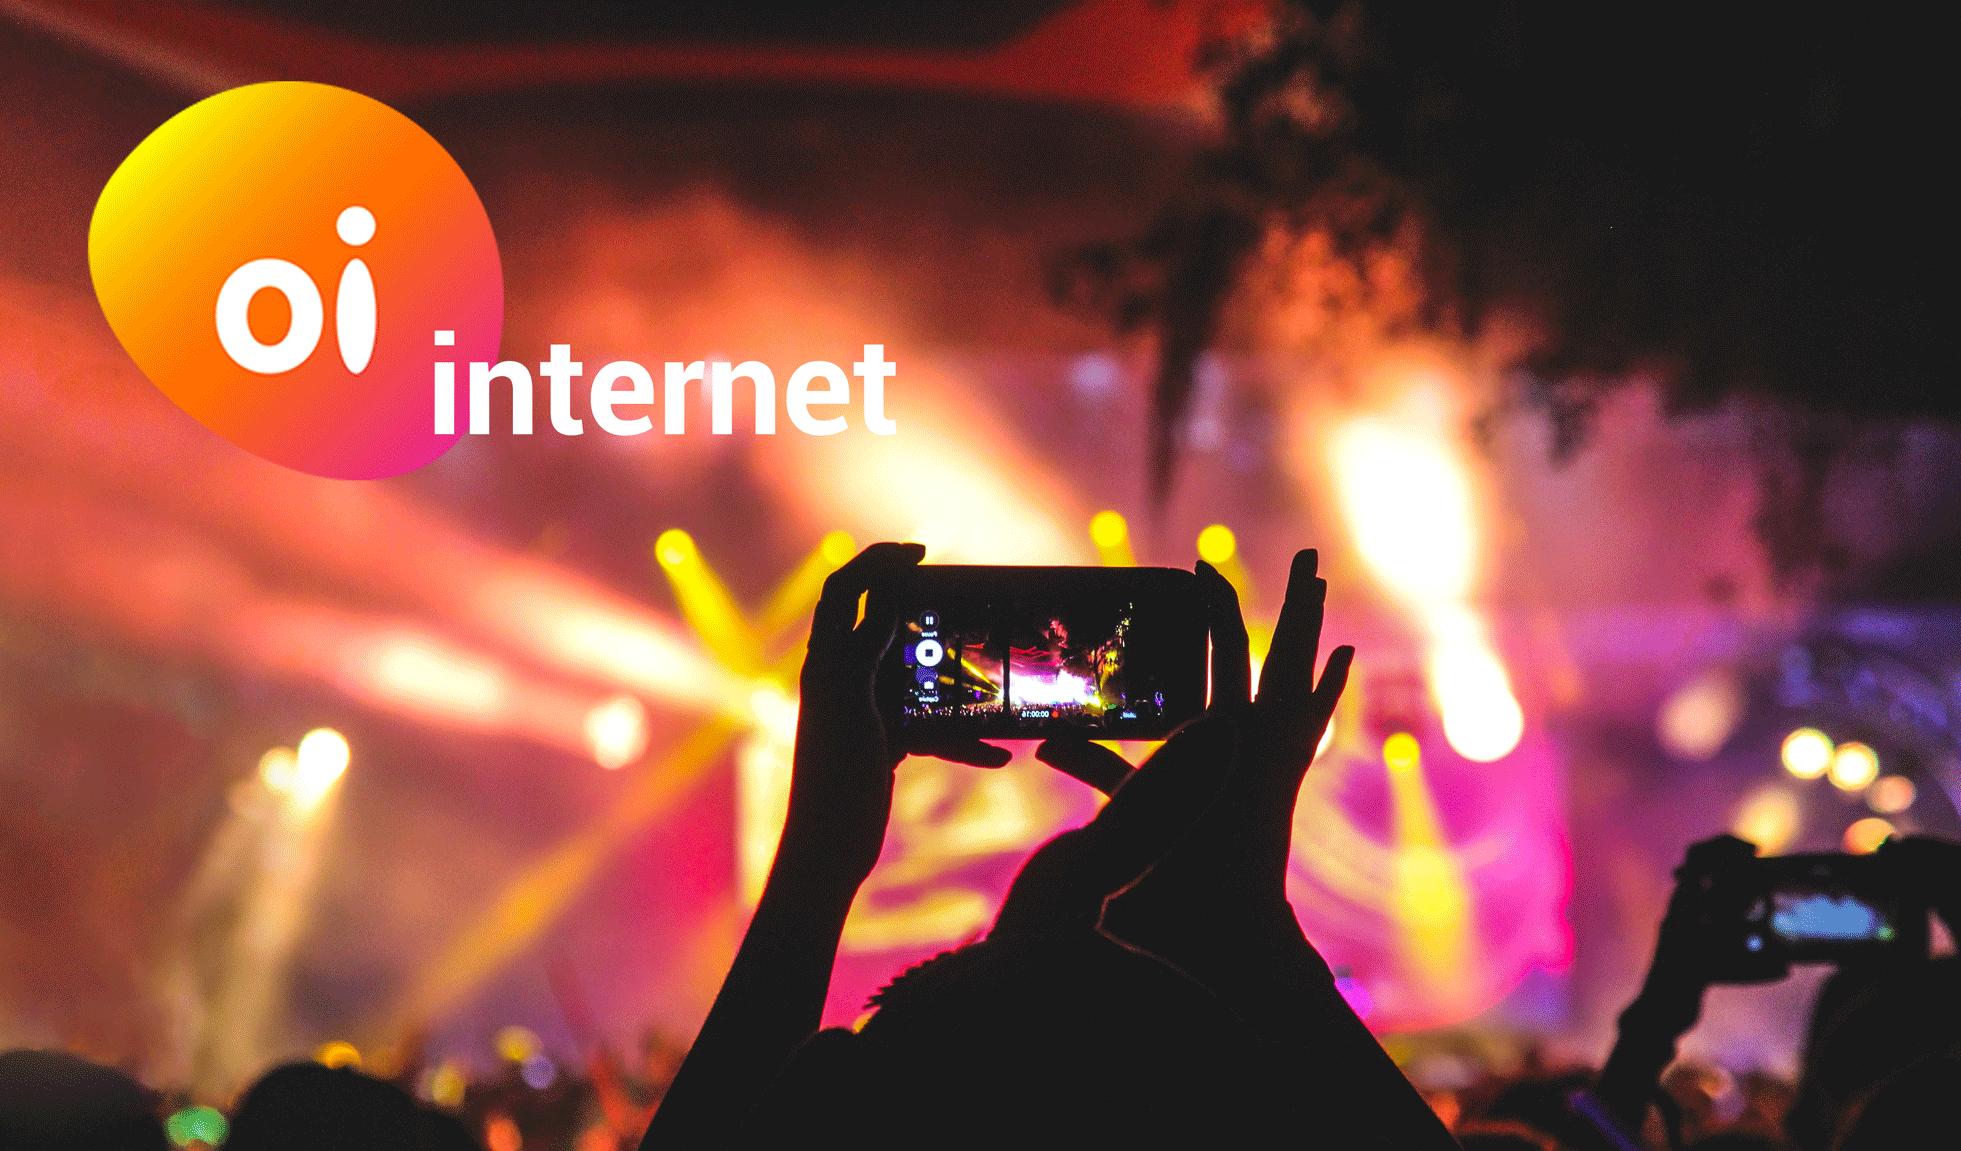 oi internet móvel